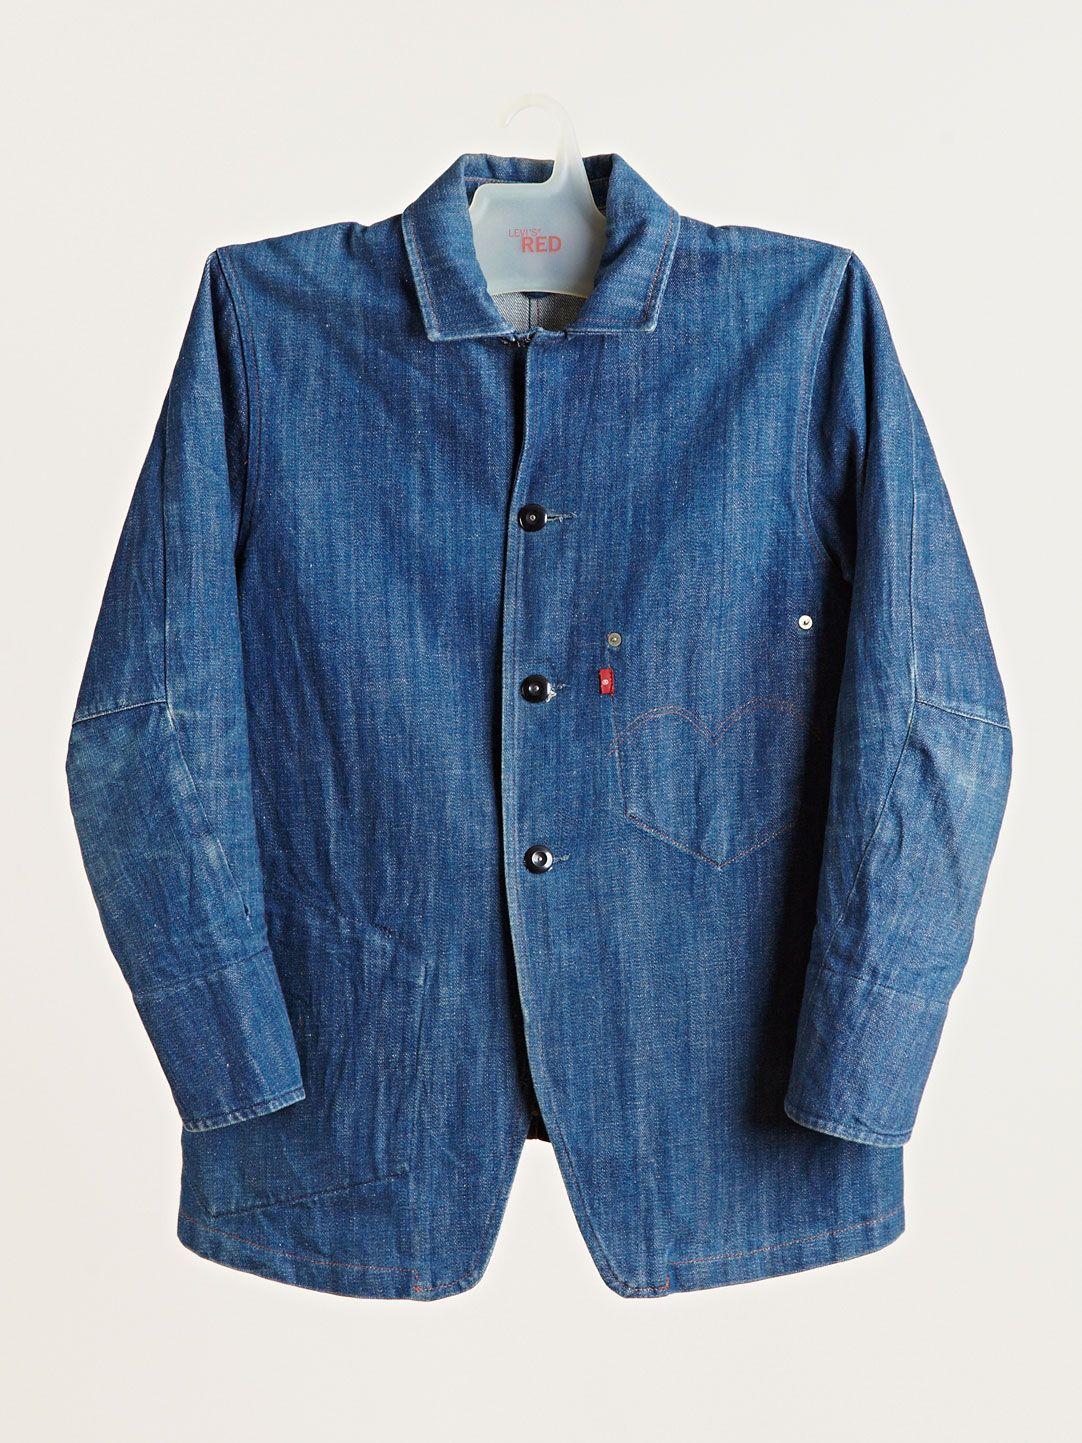 Levi S Red Archive Men S Blue Print Denim Jacket Worker In 2018